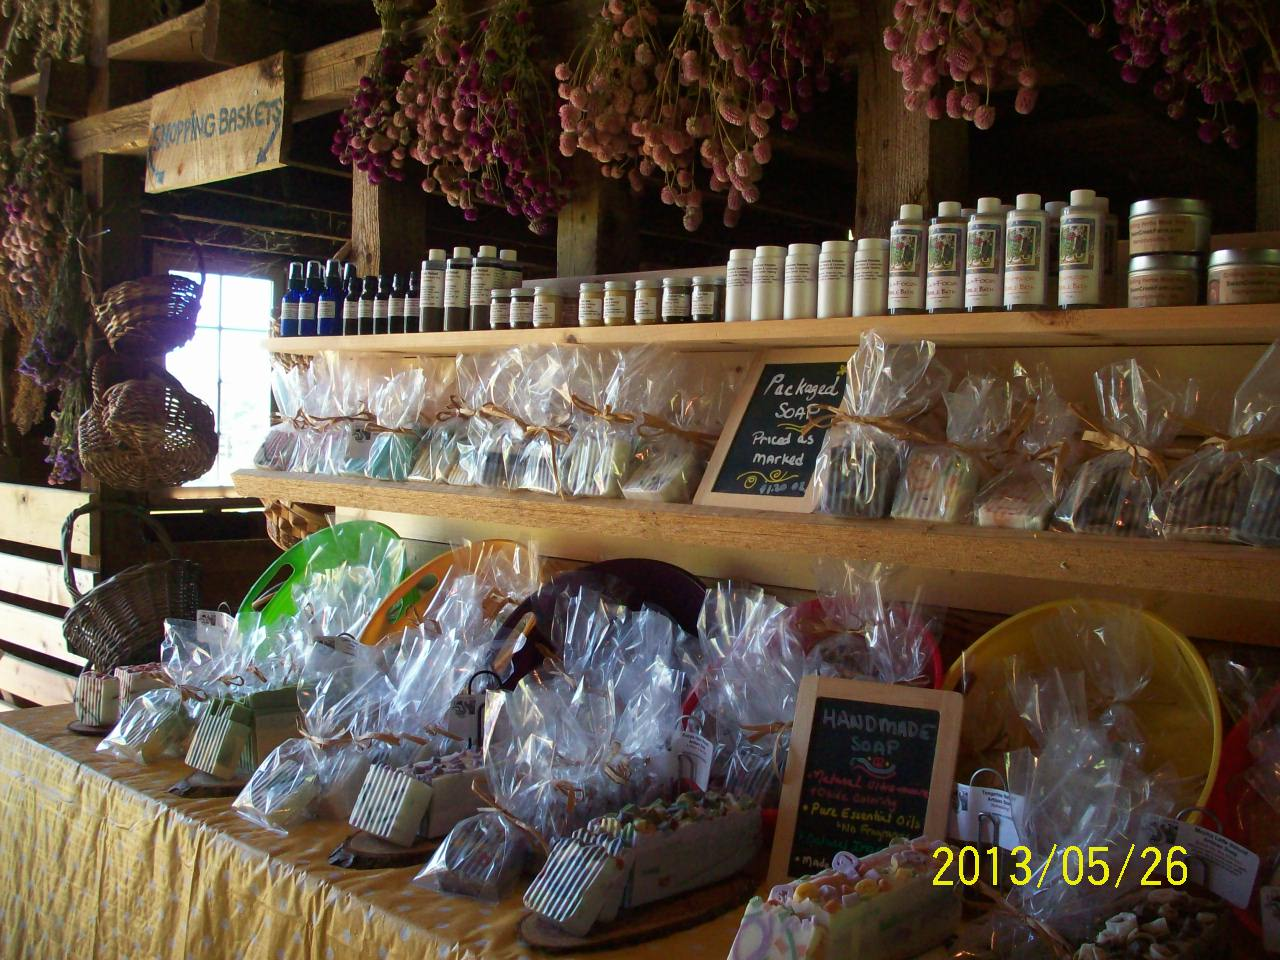 herbal remedies - handmade soap at medicinal herb farm